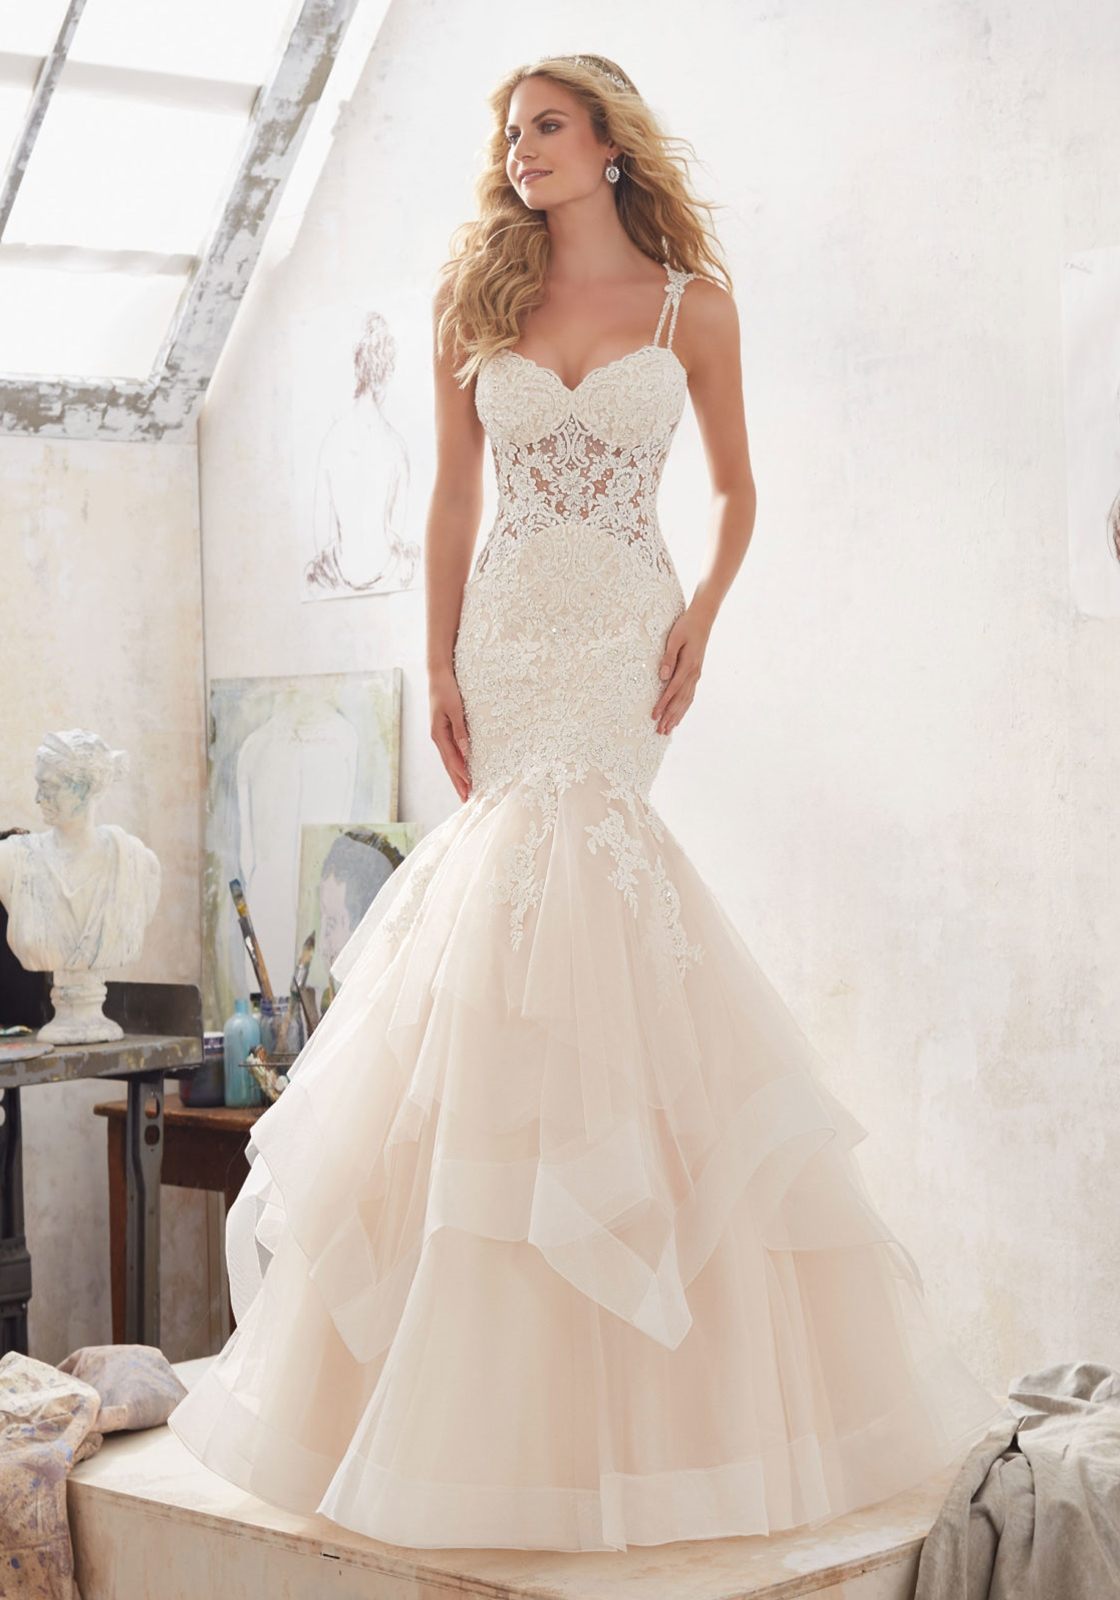 Affordable Mori Lee Wedding Dresses Designer Bridal Gowns With Dress Price Range